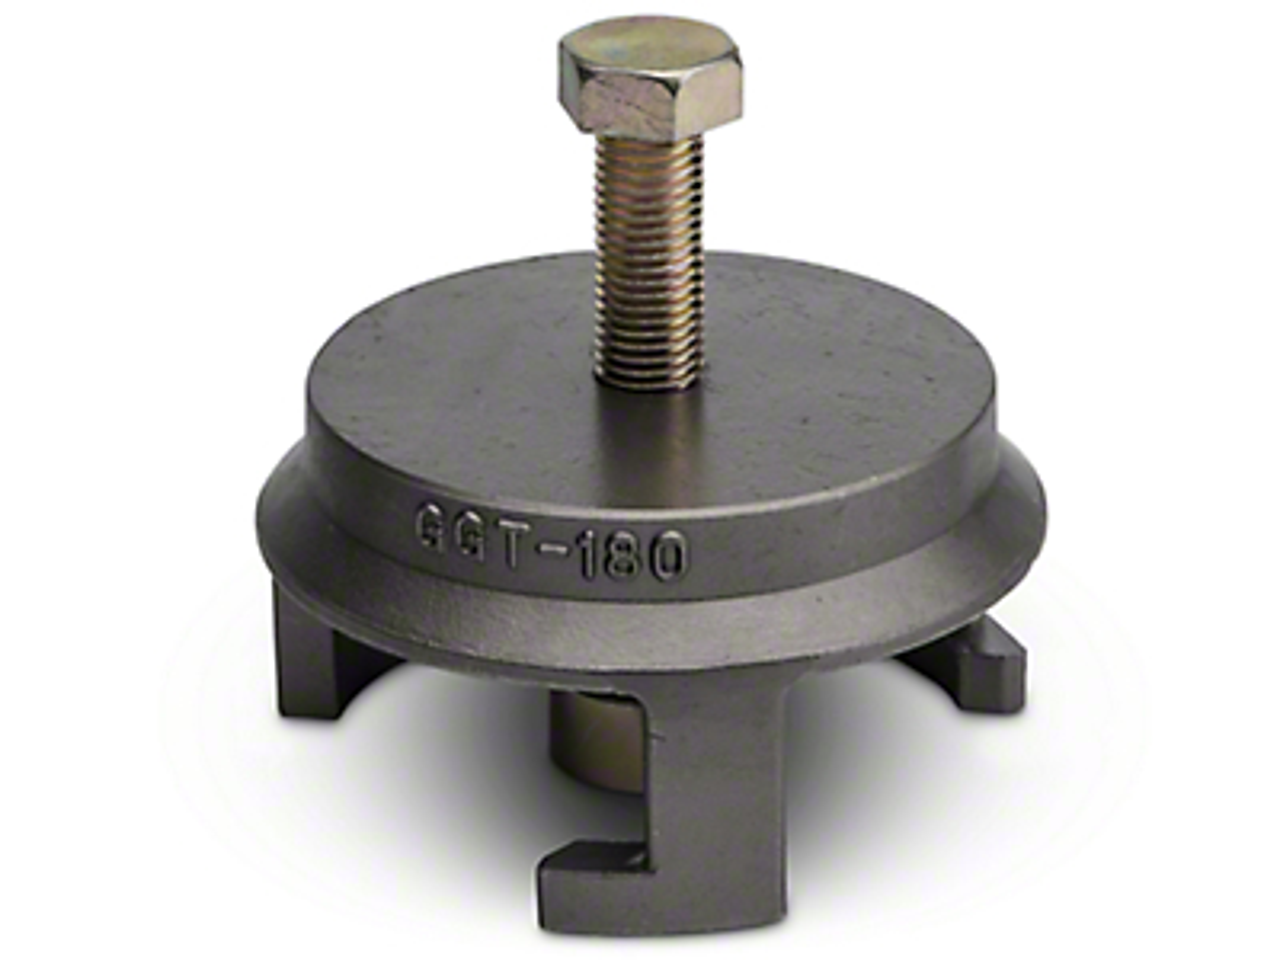 Nornda Harmonic Balancer Removal Tool (11-14 GT; 12-13 BOSS)